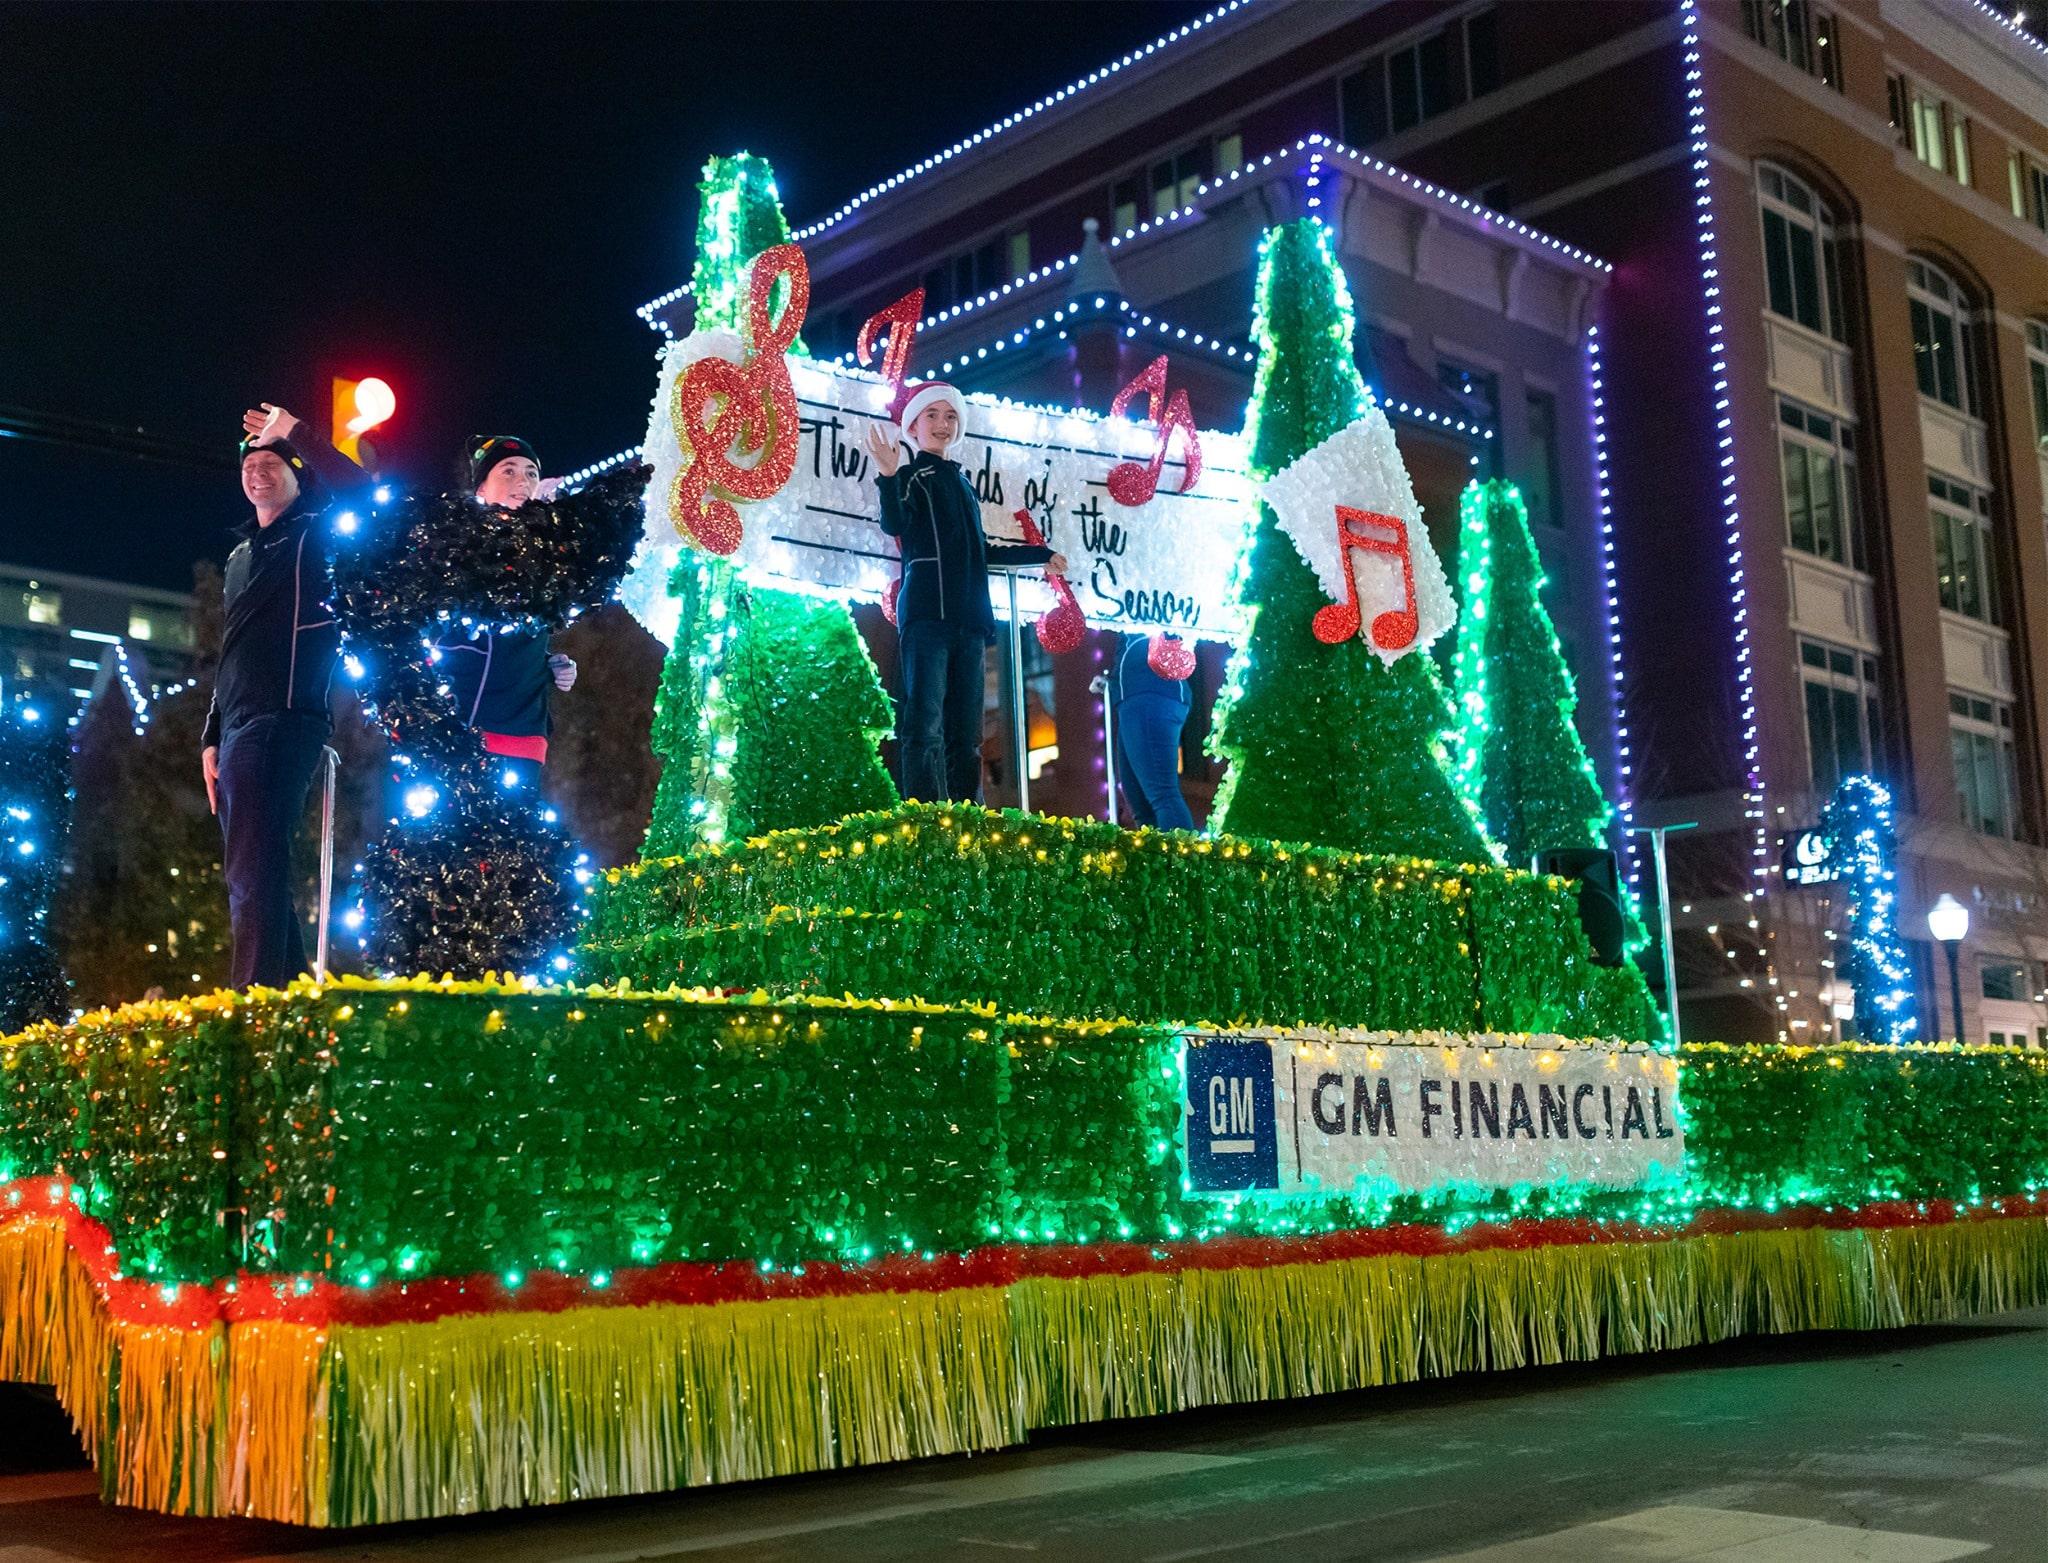 GM Financial Parade of Lights